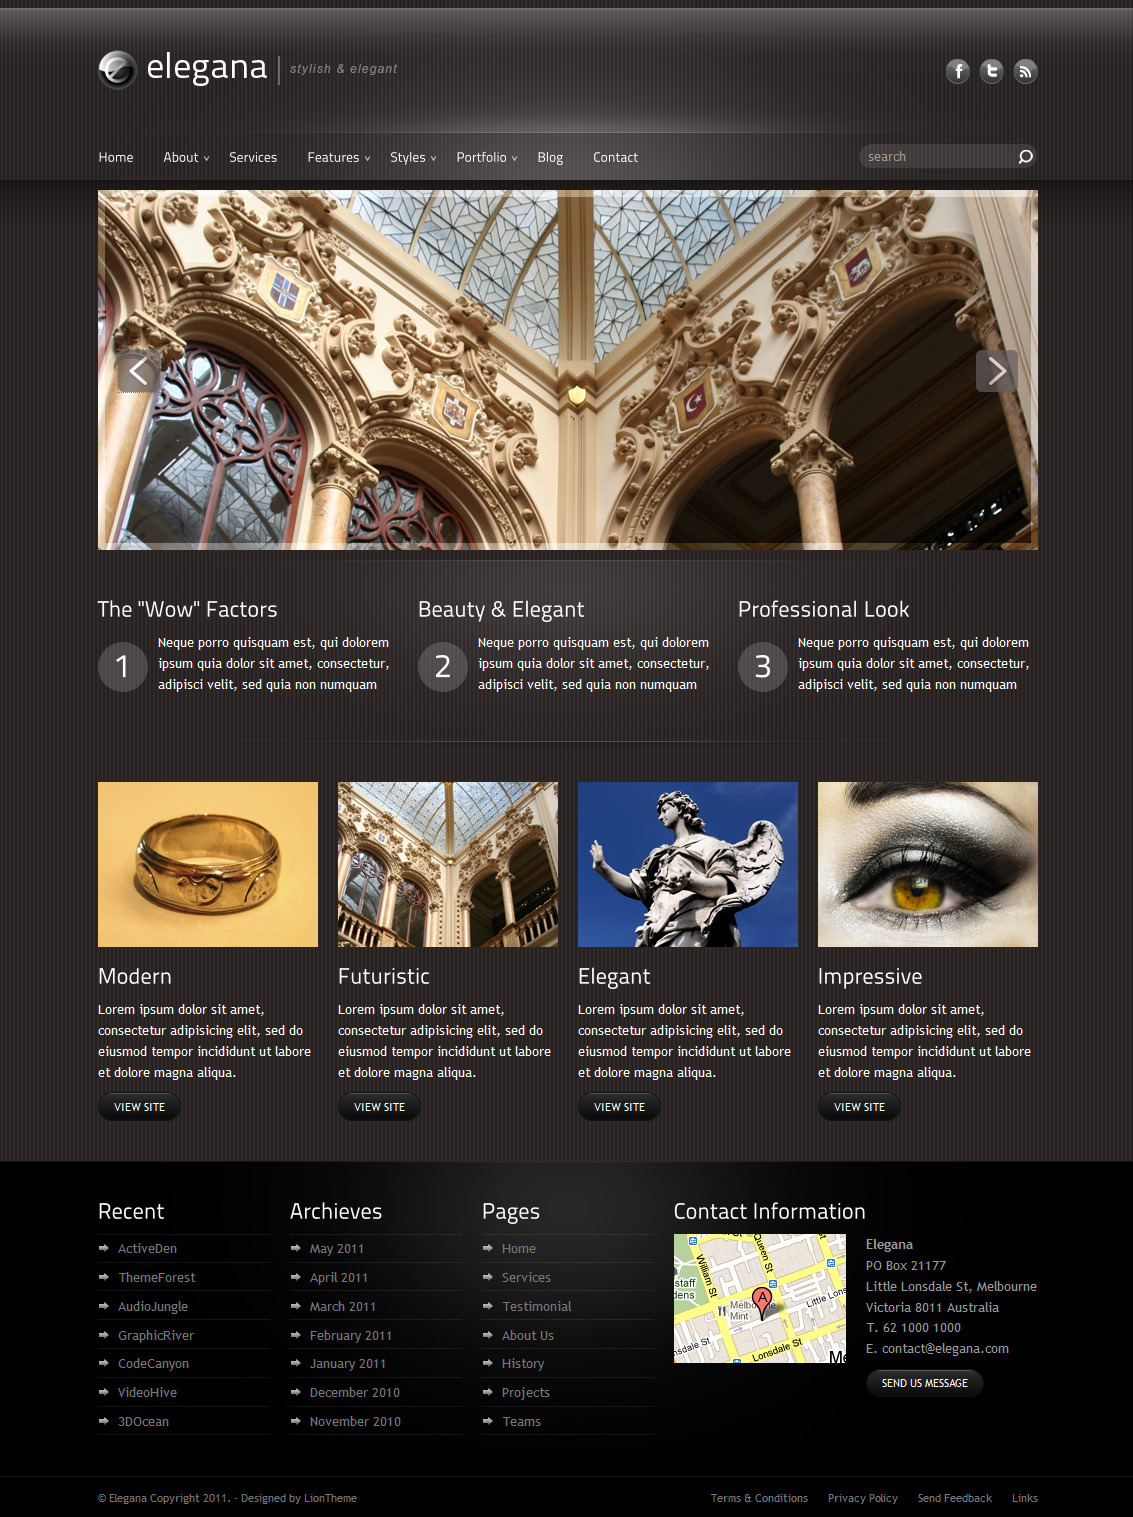 Elegana -  Clean and Elegant Website Template